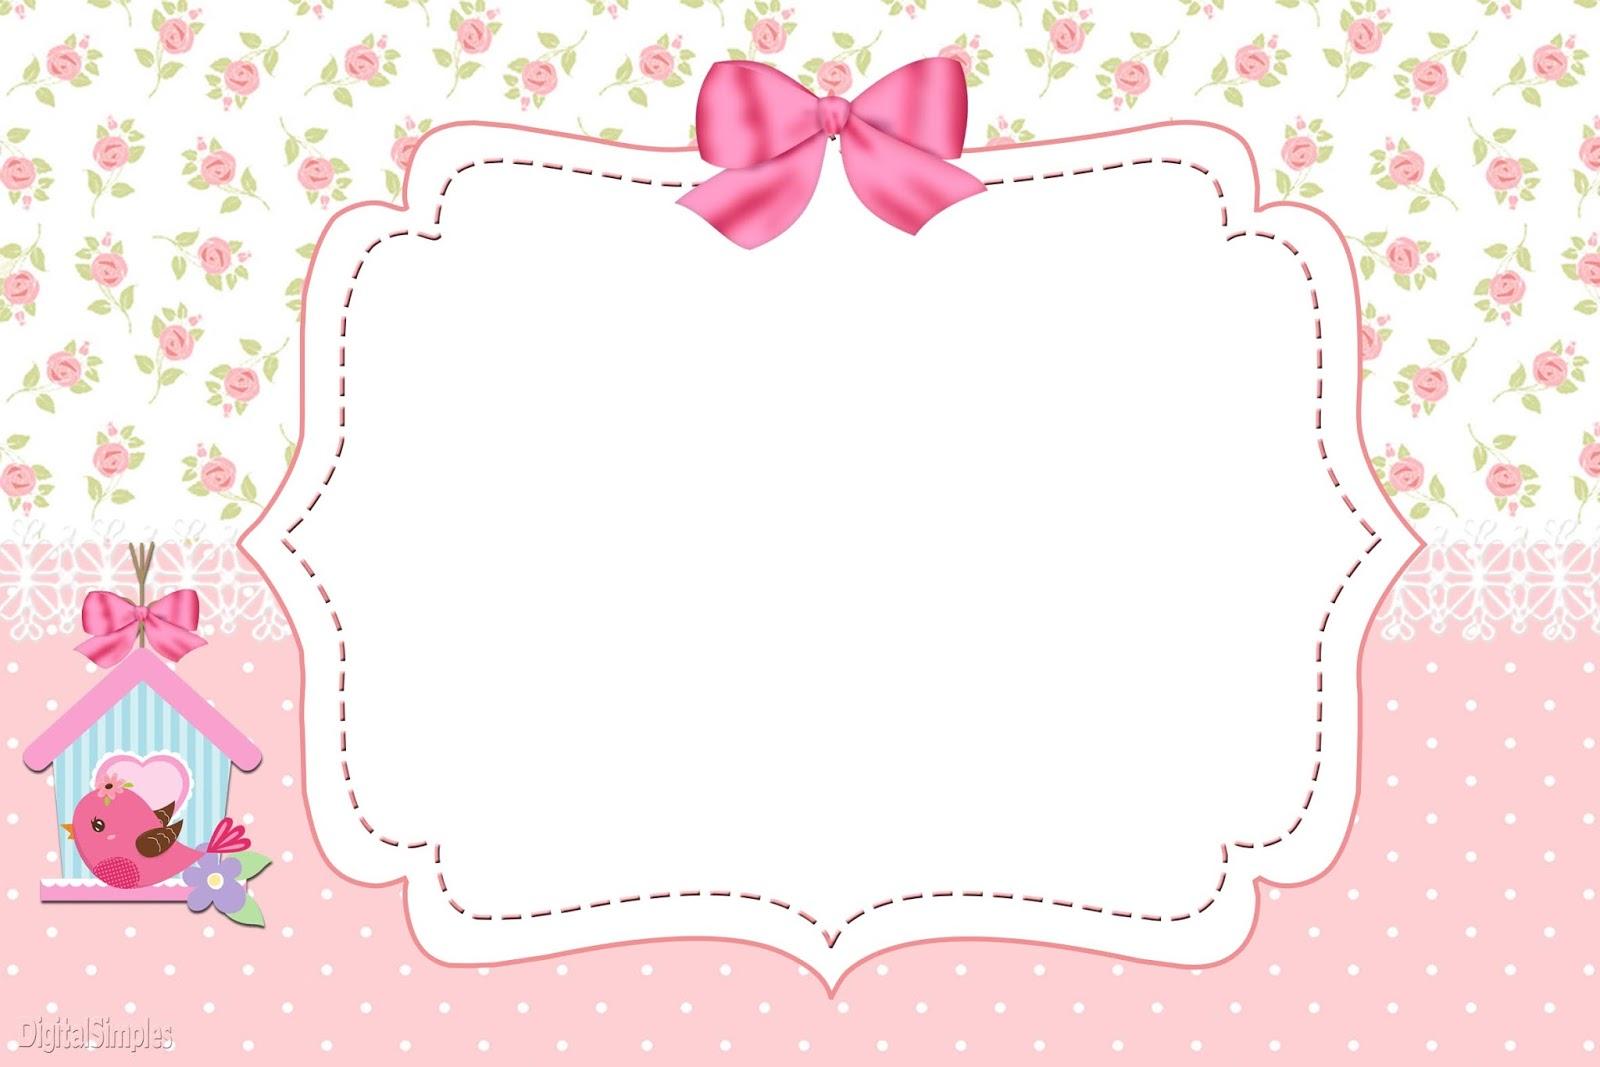 Passarinhos para Meninas para Imprimir  Convites Digitais Si